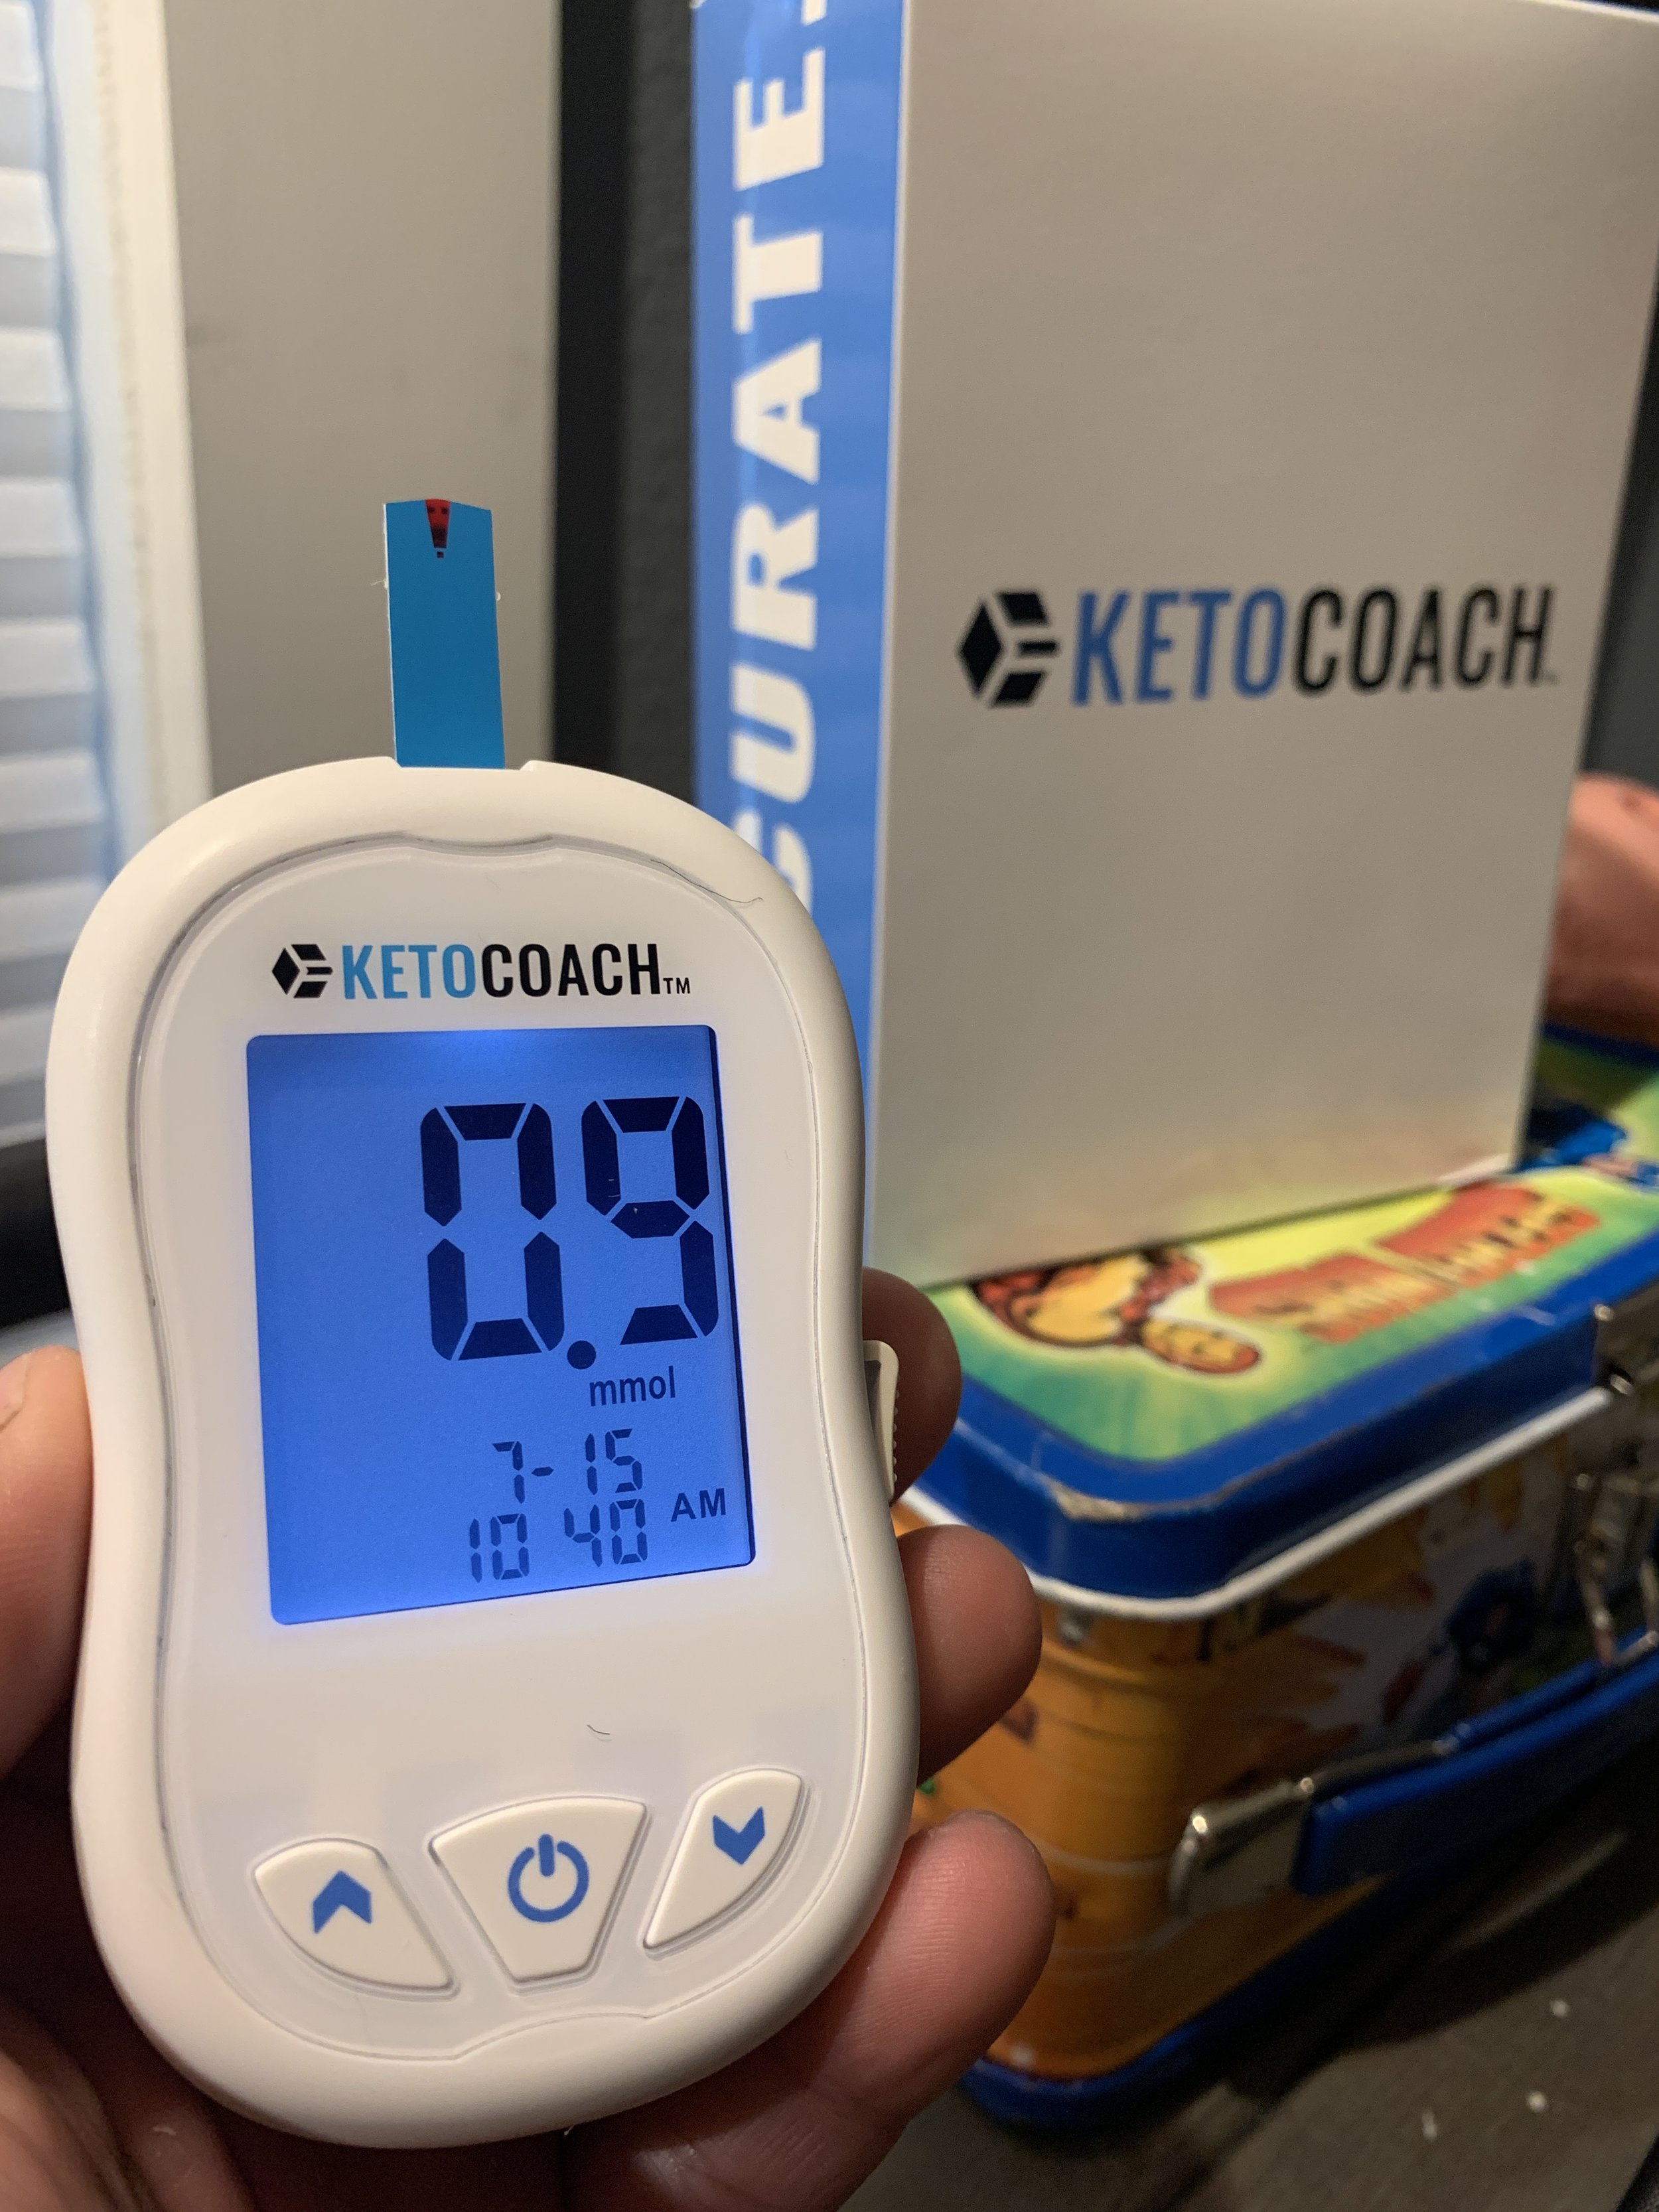 ketocoach-discount-code.JPG